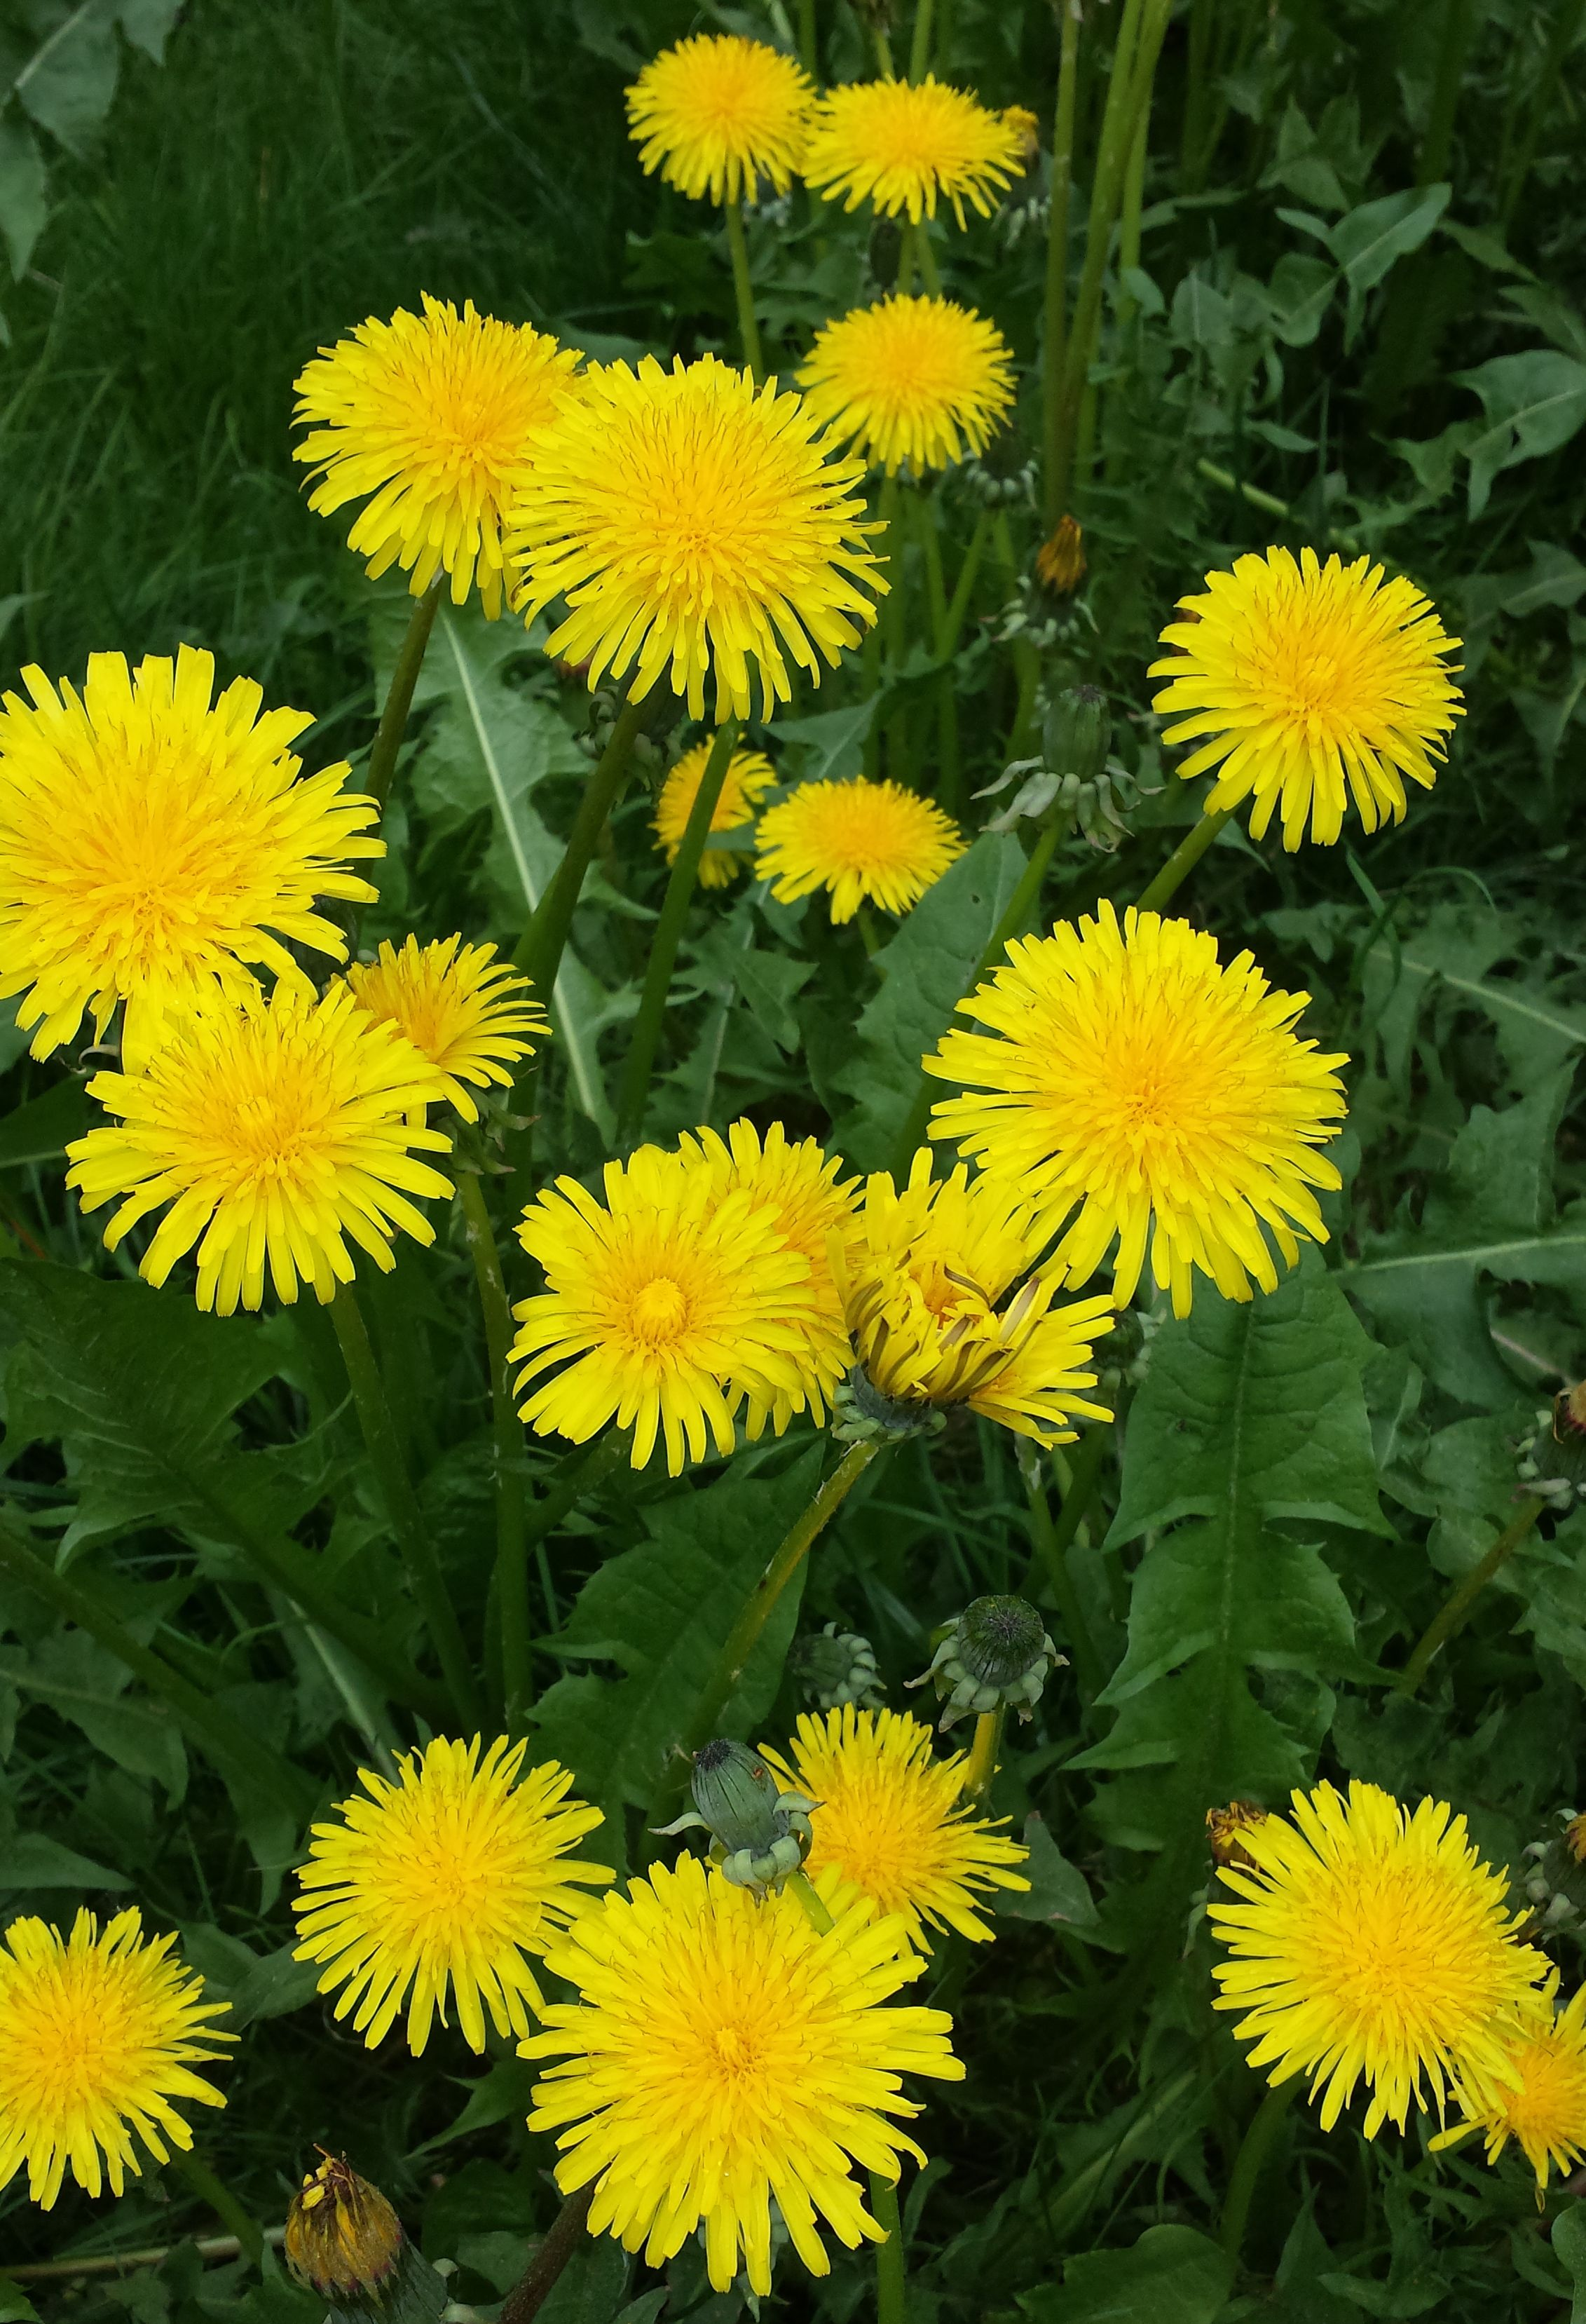 Pin By Chandran Pullekat On Zheltyj Zheltyj Zheltyj Dandelion Flower Yellow Flowers Happy Flowers